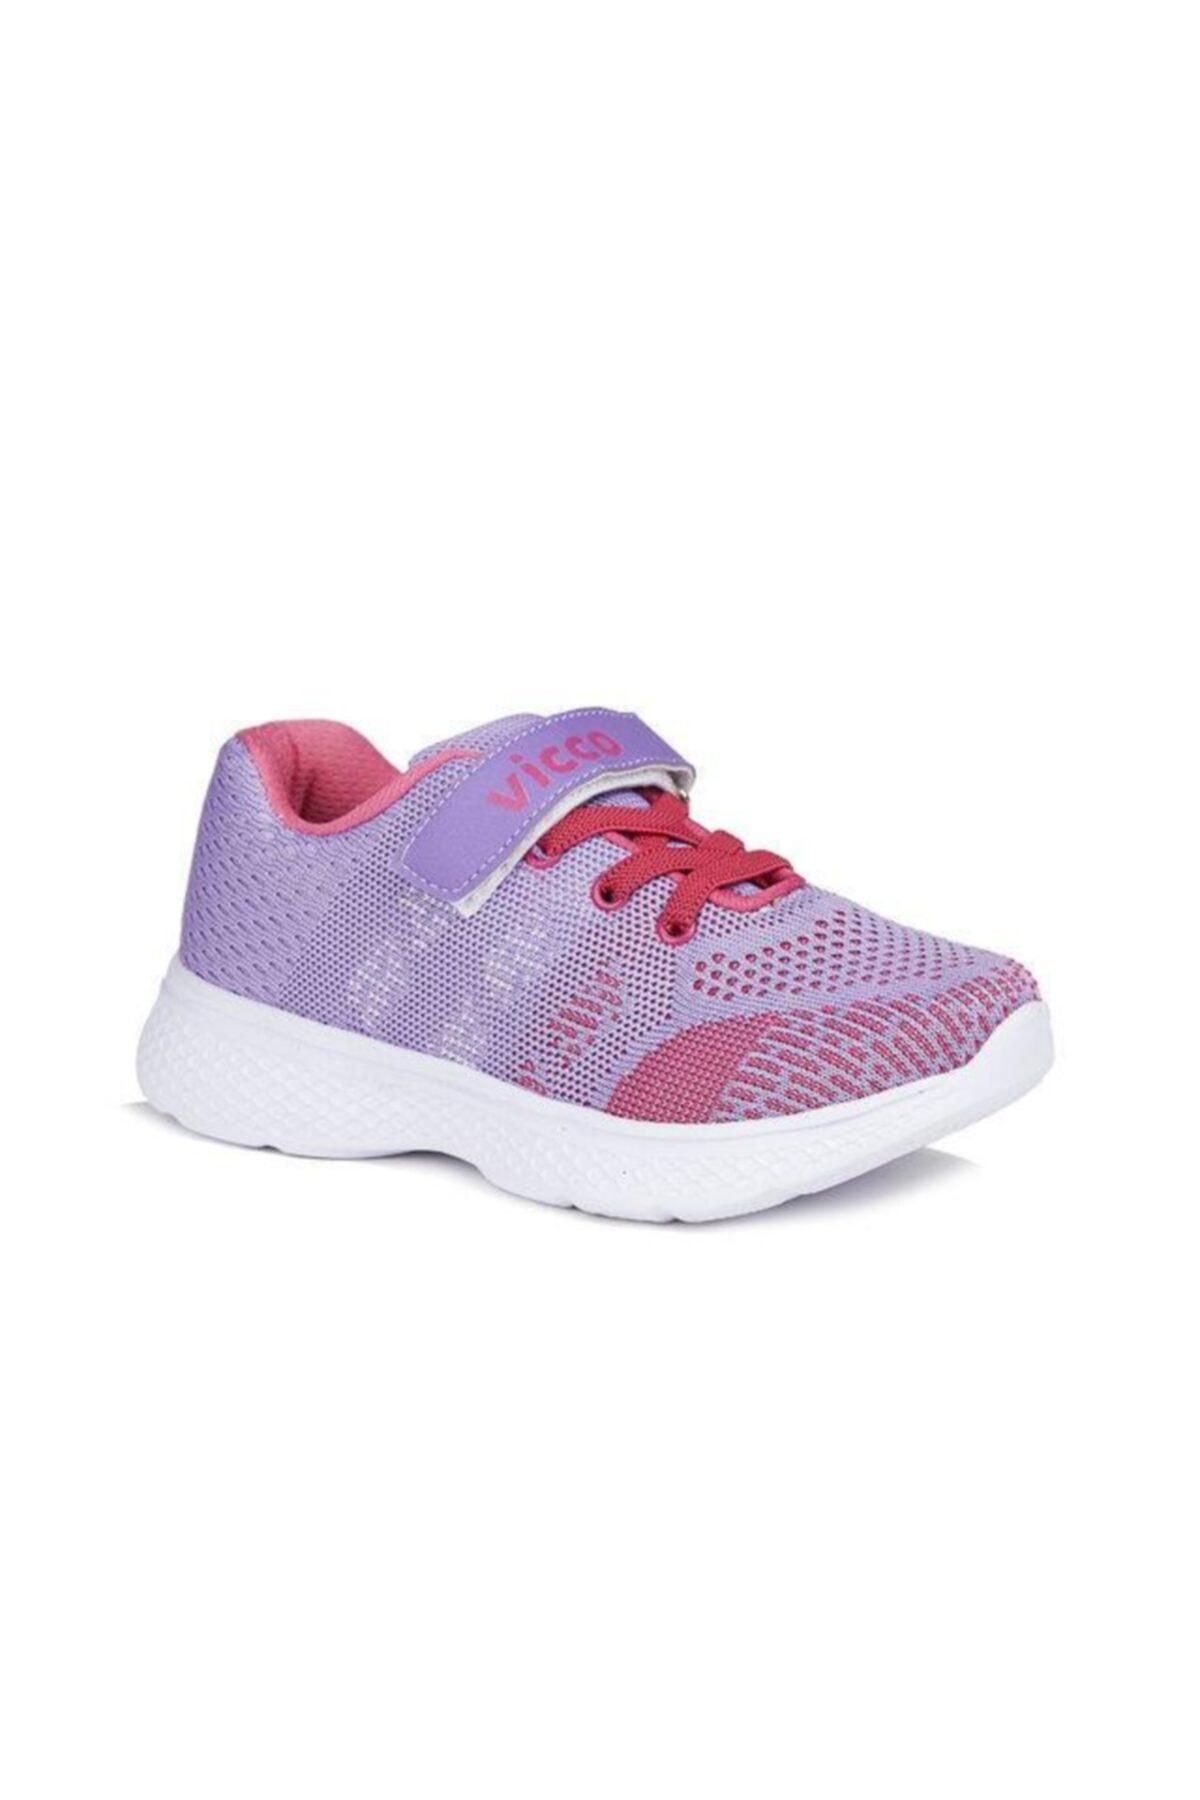 Vicco 346.p20y.215 Hutson Kız Çocuk Spor Ayakkabı Lila 26-29 1